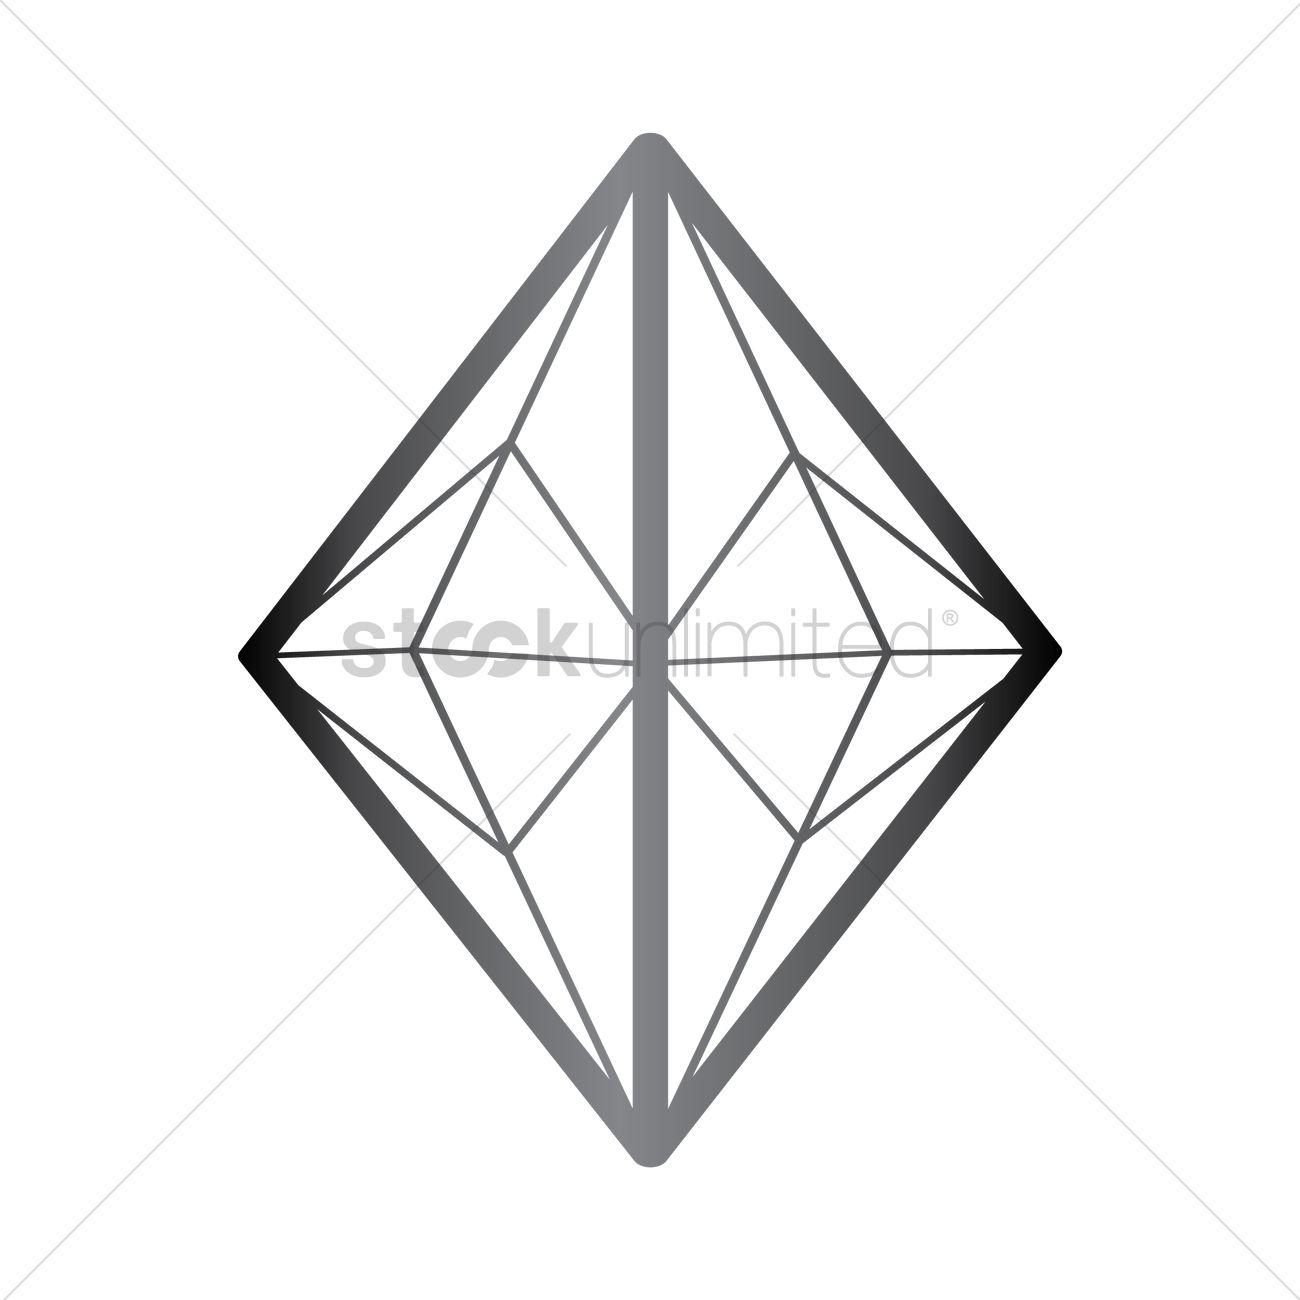 hight resolution of rhombus diamond structure vector image 1357346 stockunlimited rh stockunlimited com rhombus pattern rhombus and trapezoid